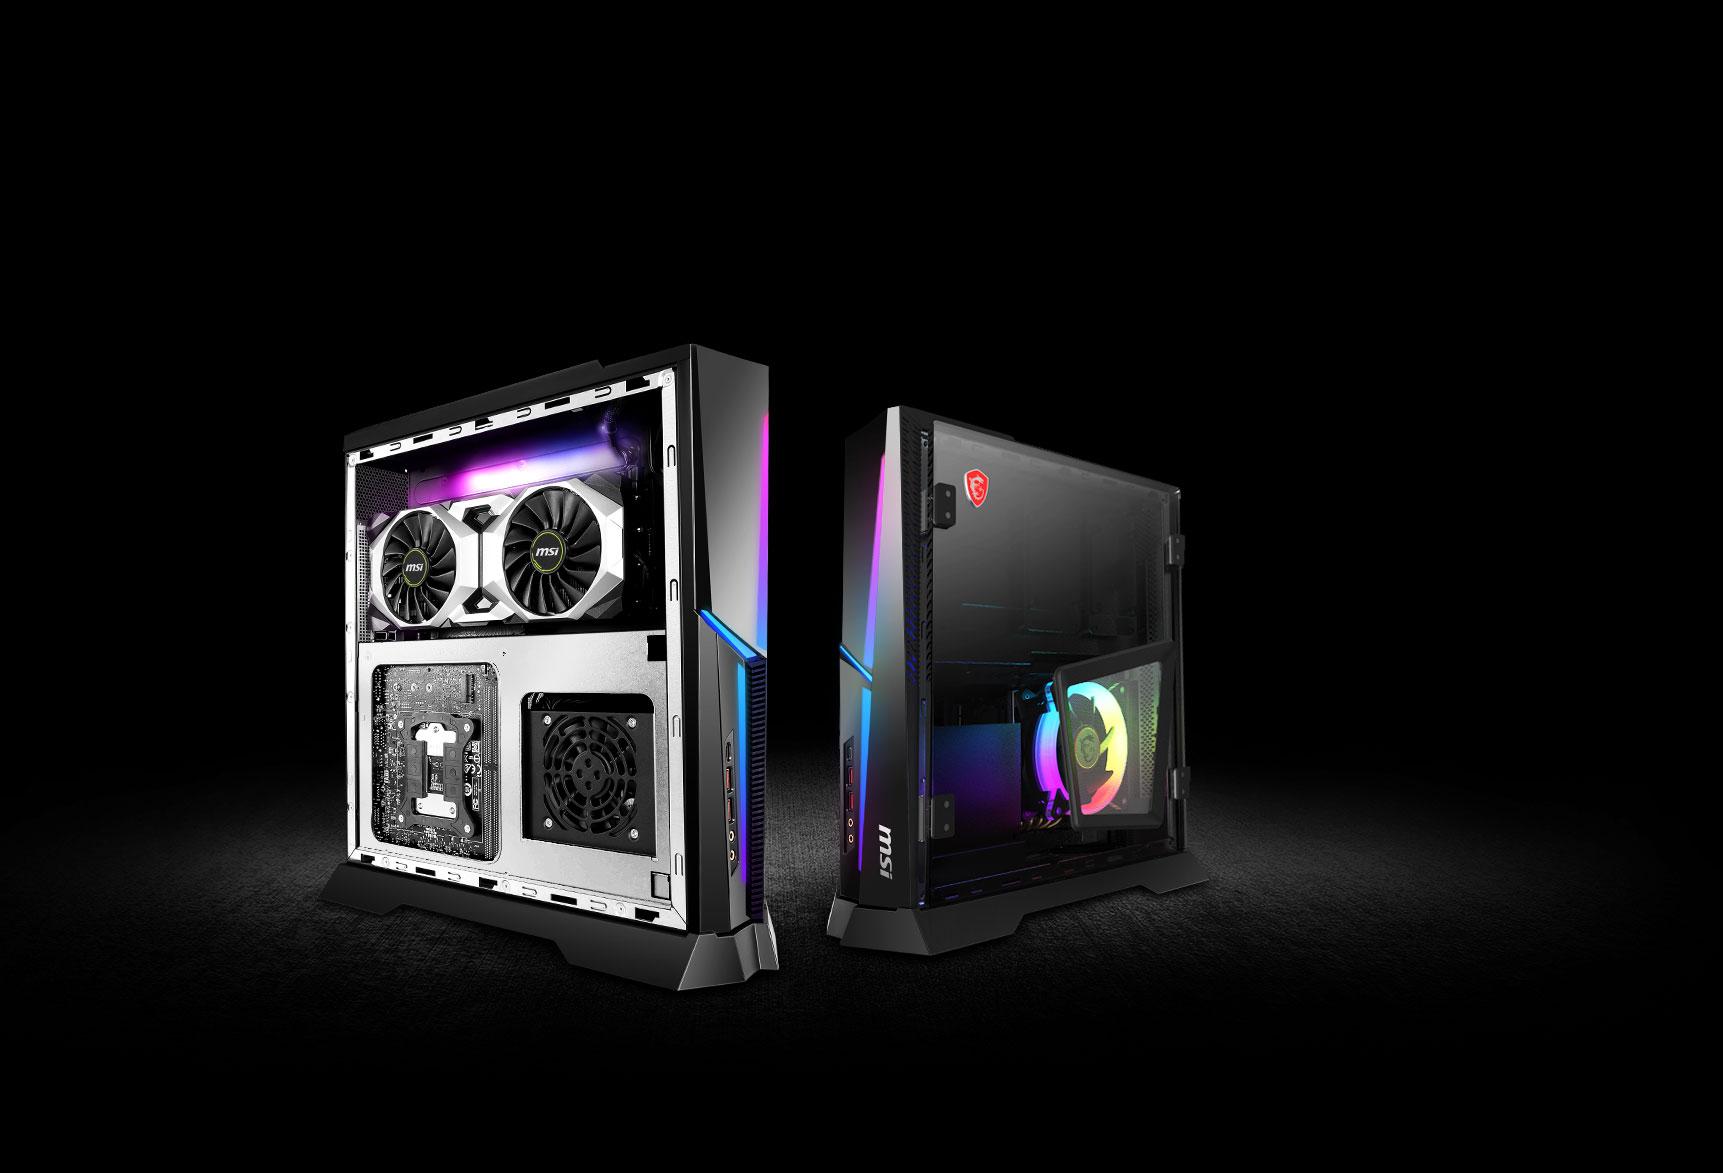 Trident A Plus 9th | Desktop - The most versatile consumer